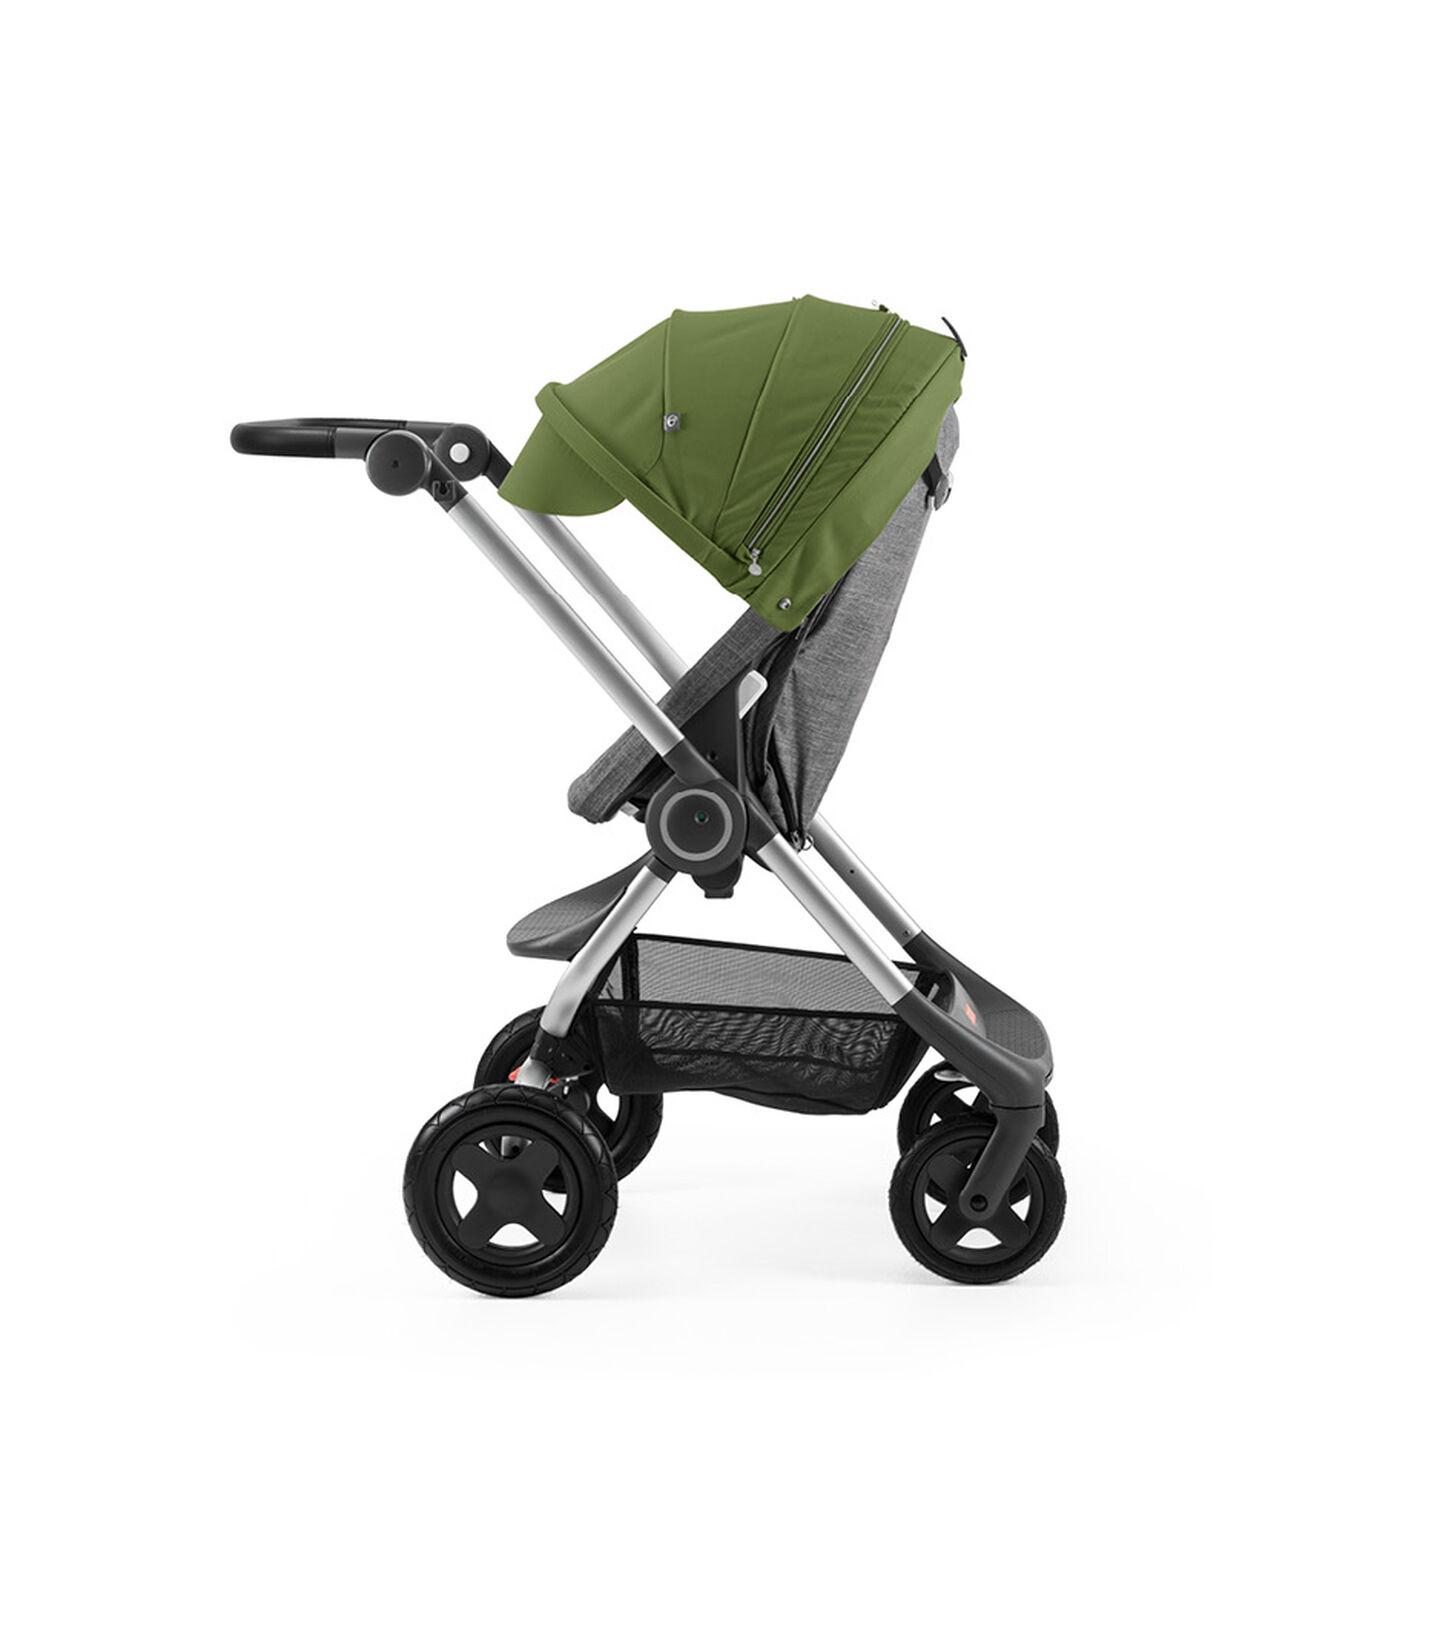 Stokke® Scoot™ kaleche grøn, Green, mainview view 1